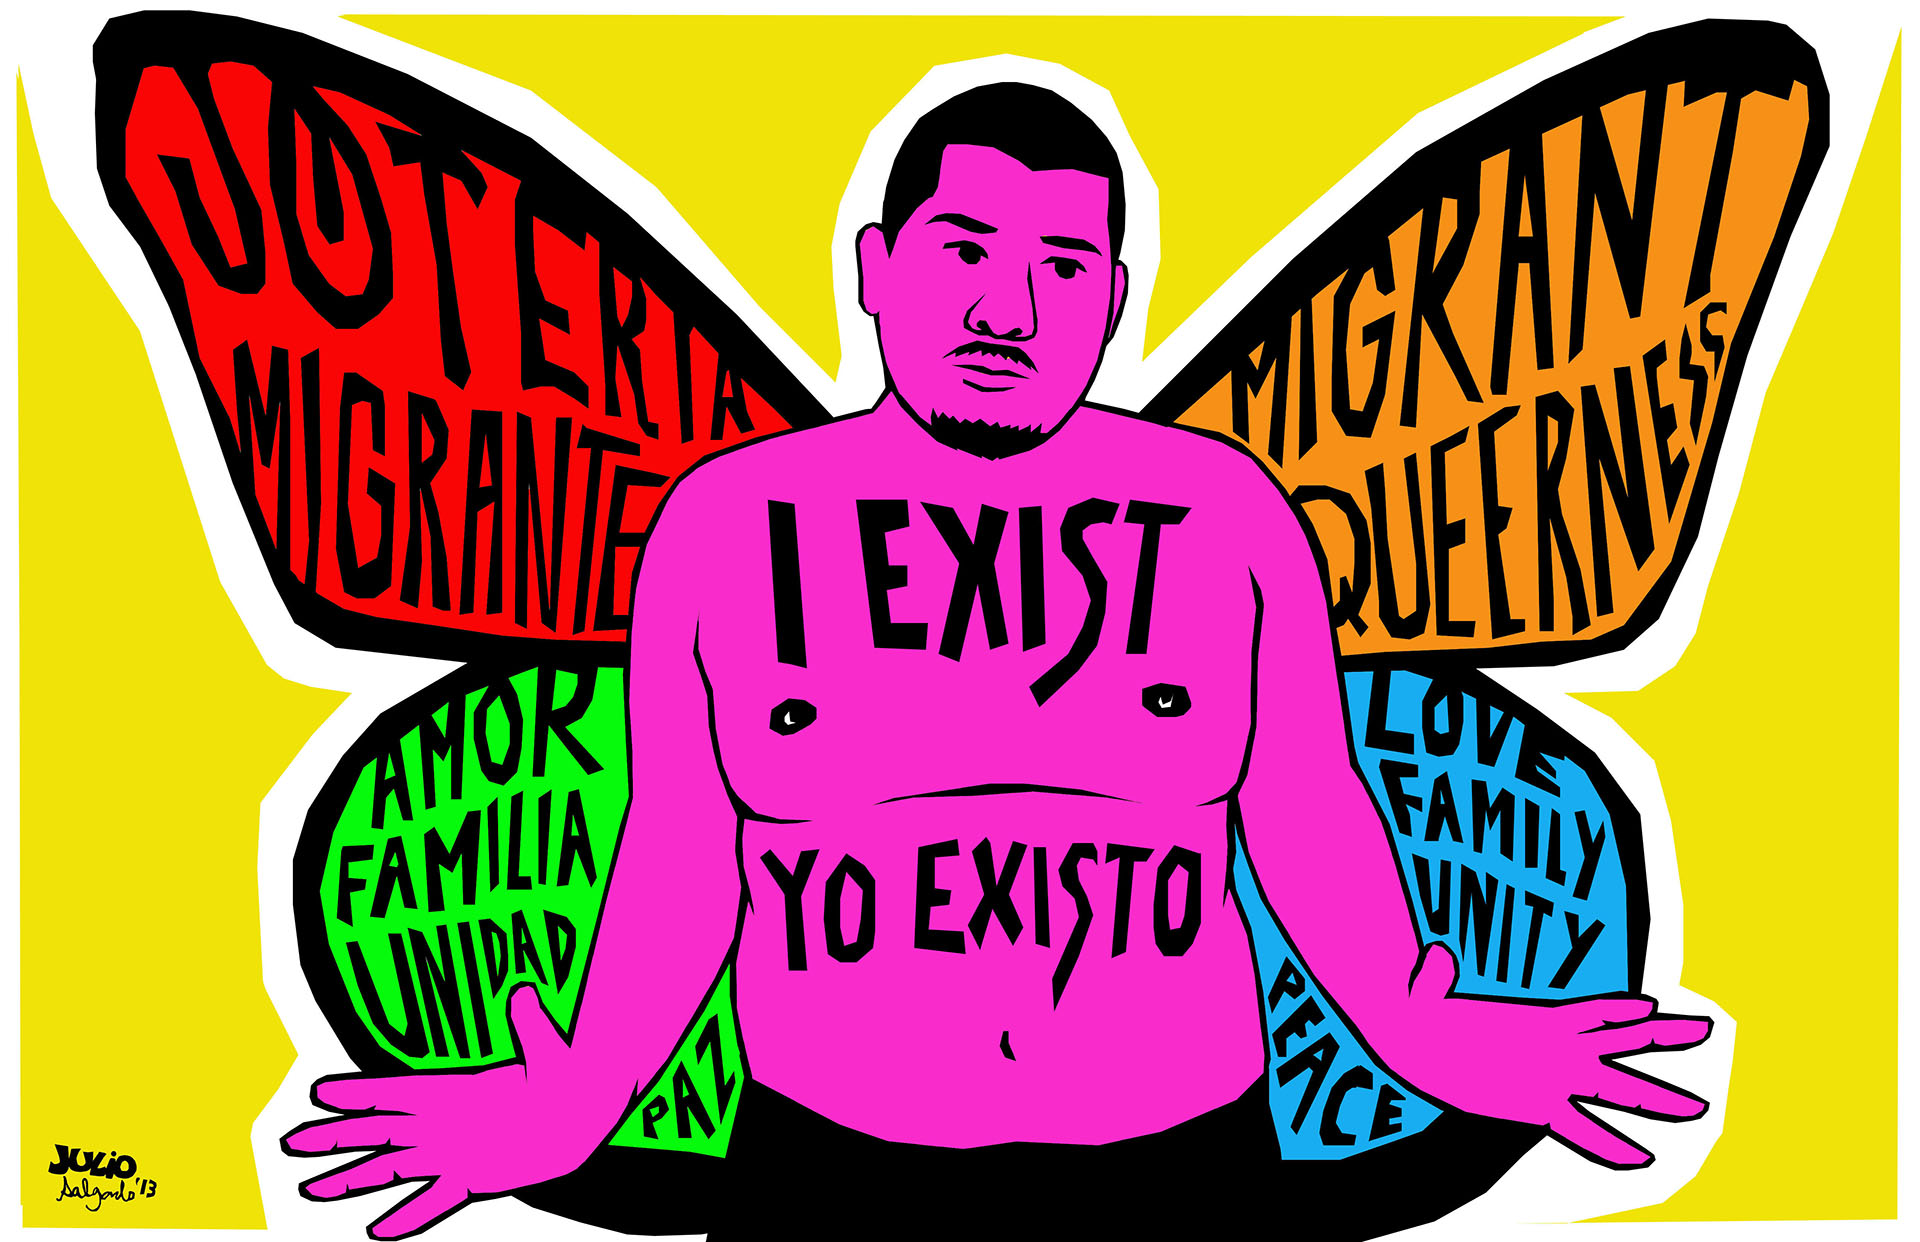 I am a butterfly, illustration by Julio Salgado